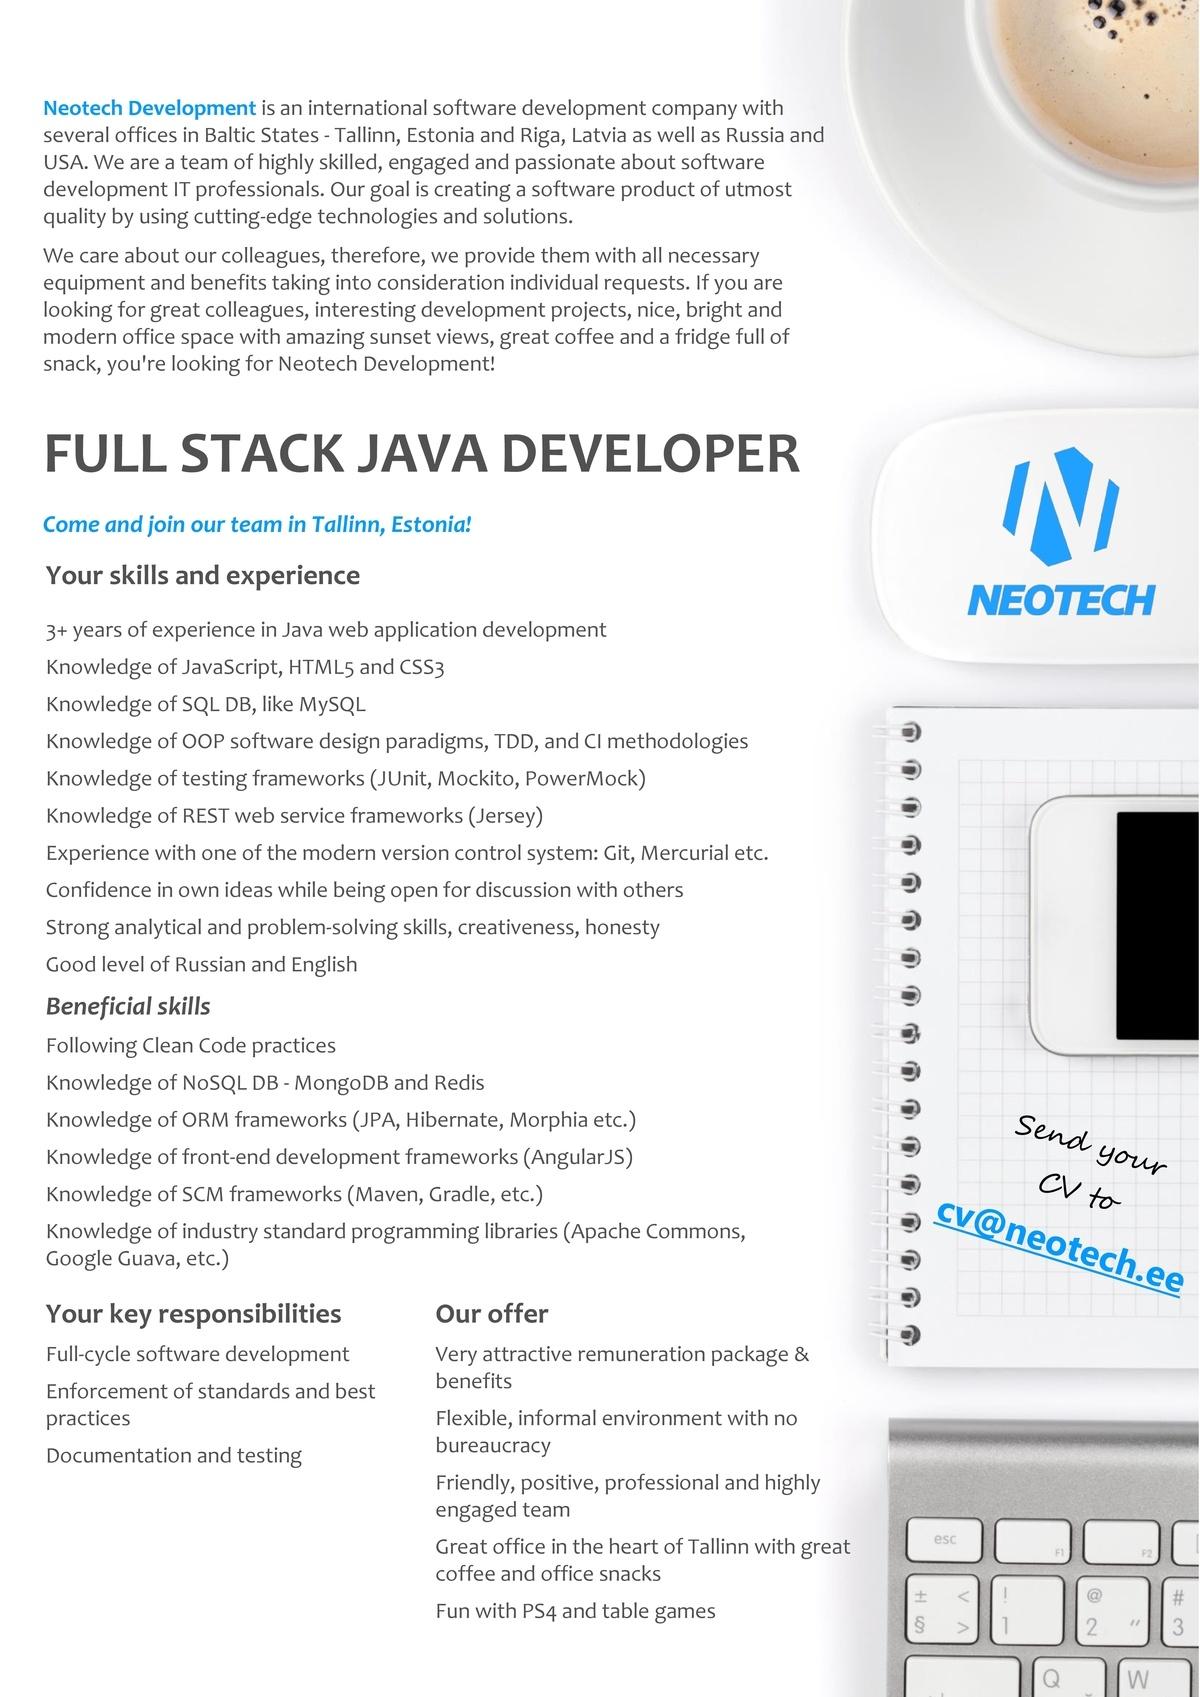 cv keskus t ouml ouml pakkumine full stack java developer toumloumlpakkumise number